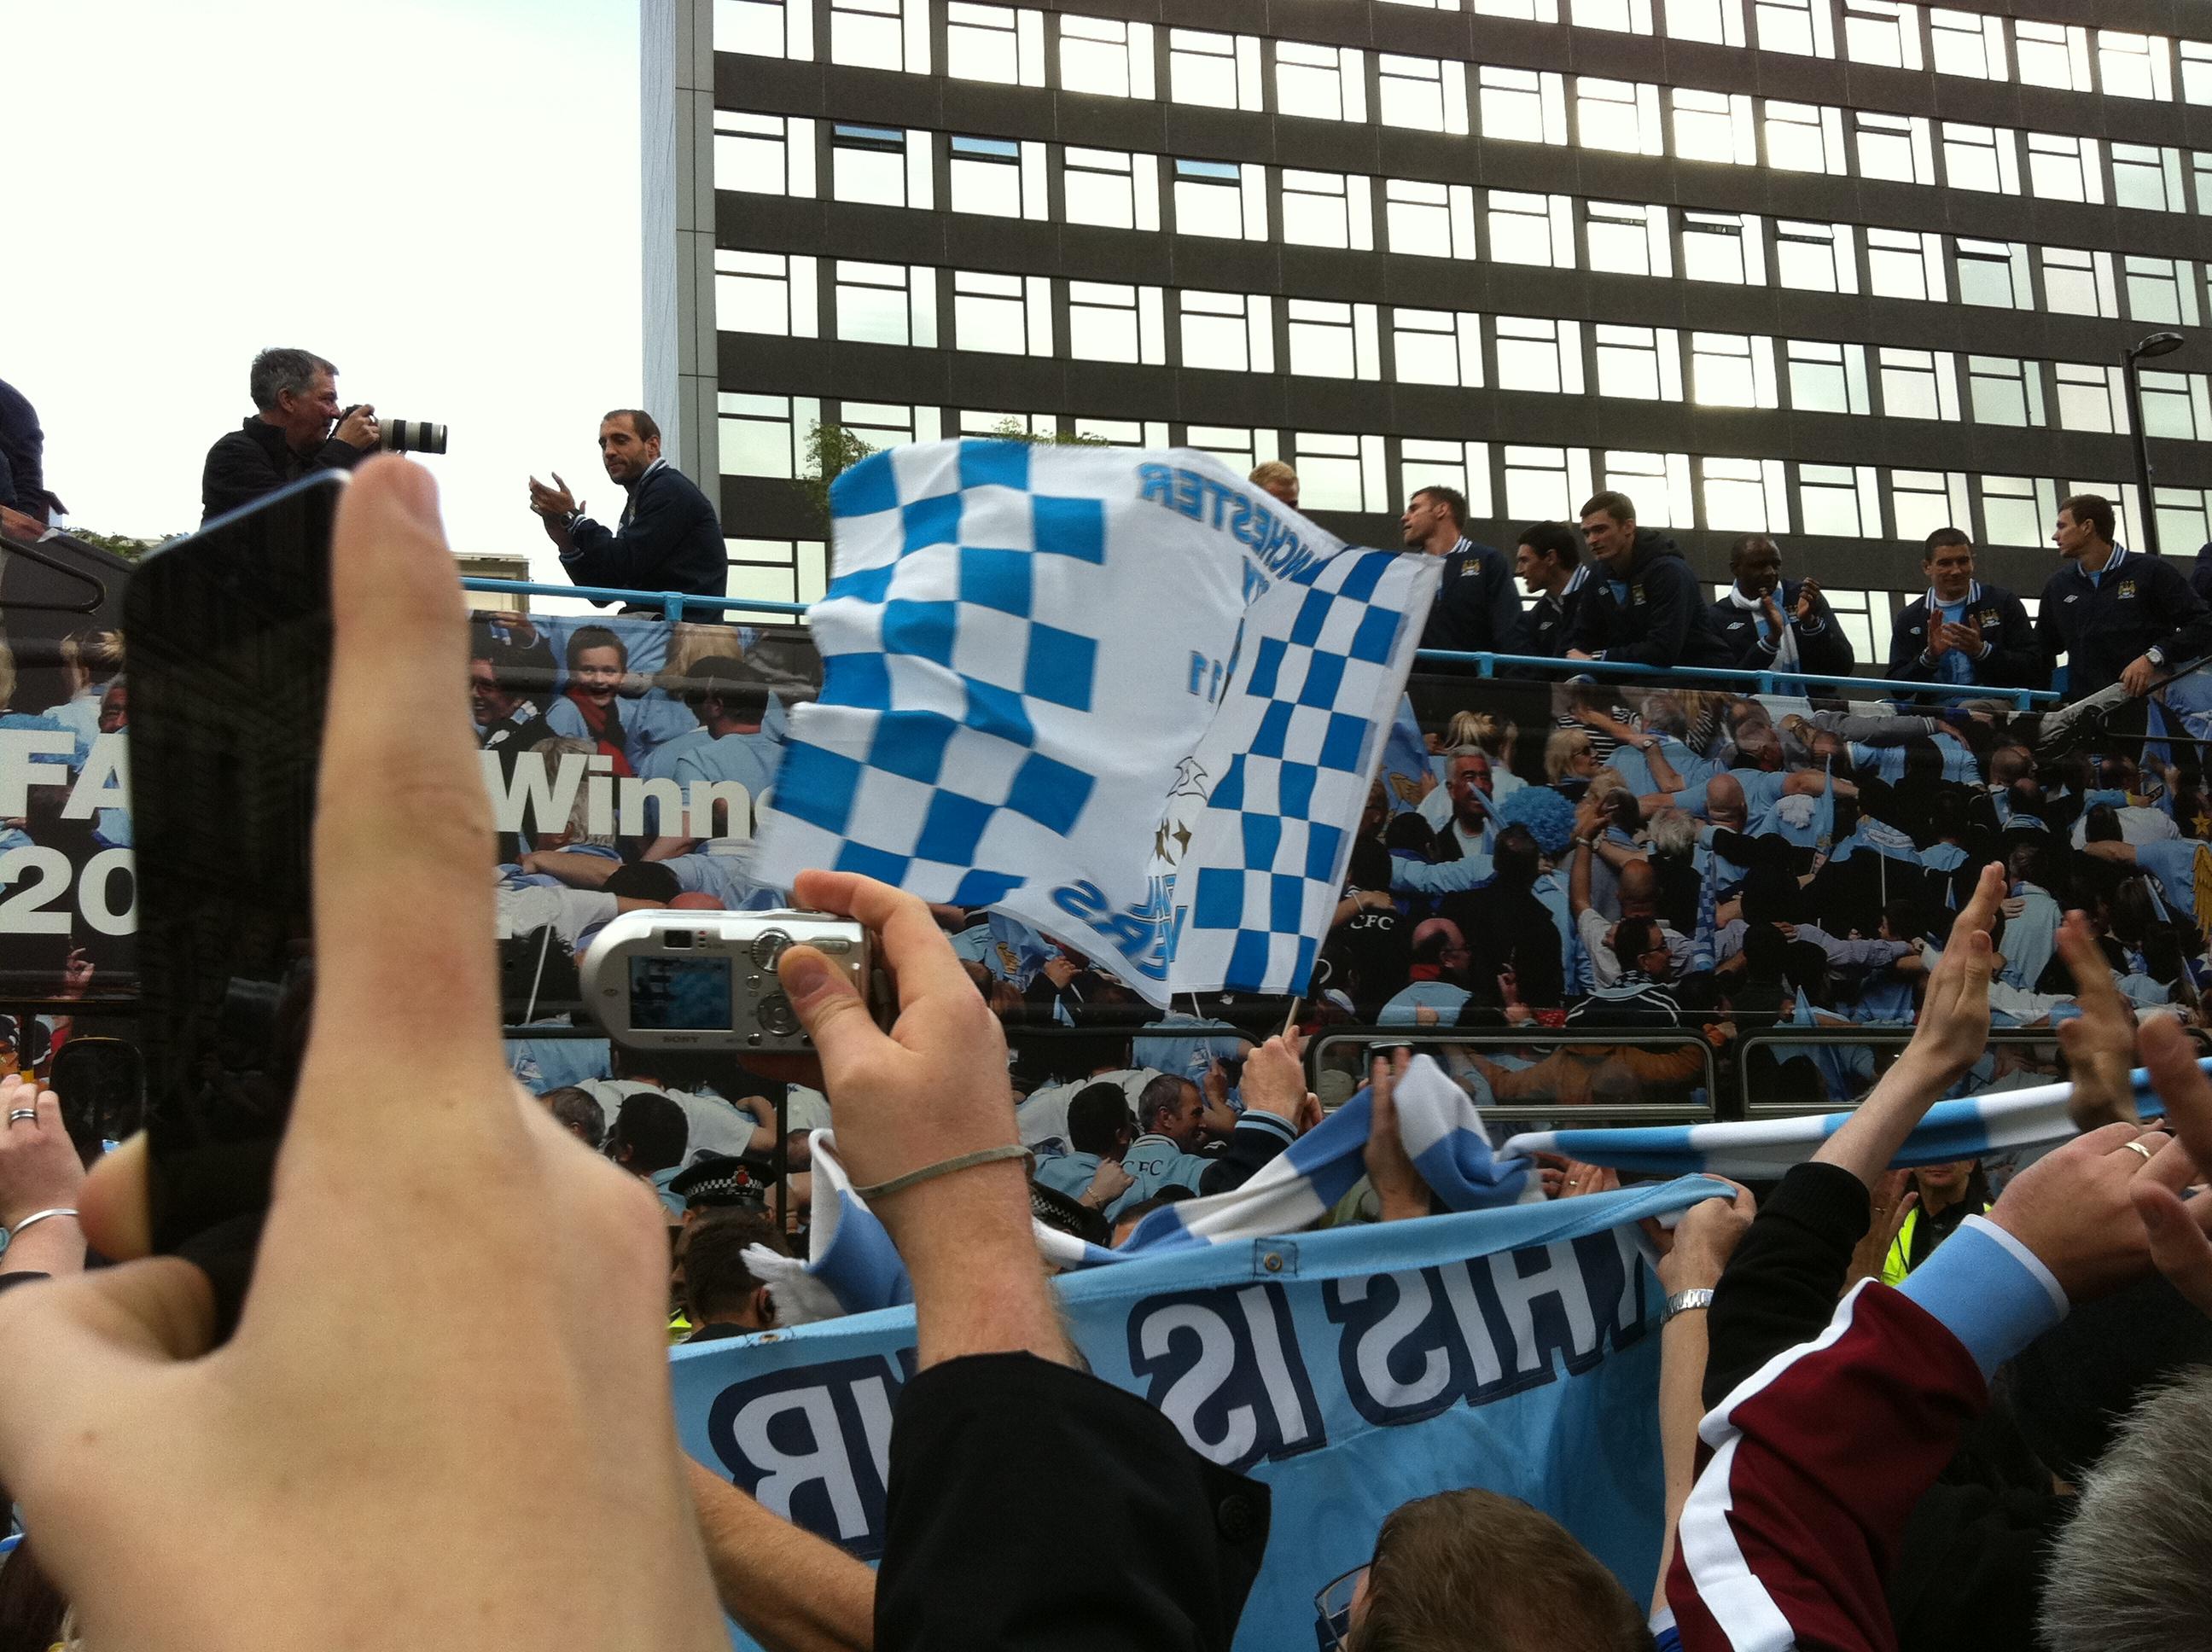 fa-cup-winners-parade_0.jpg